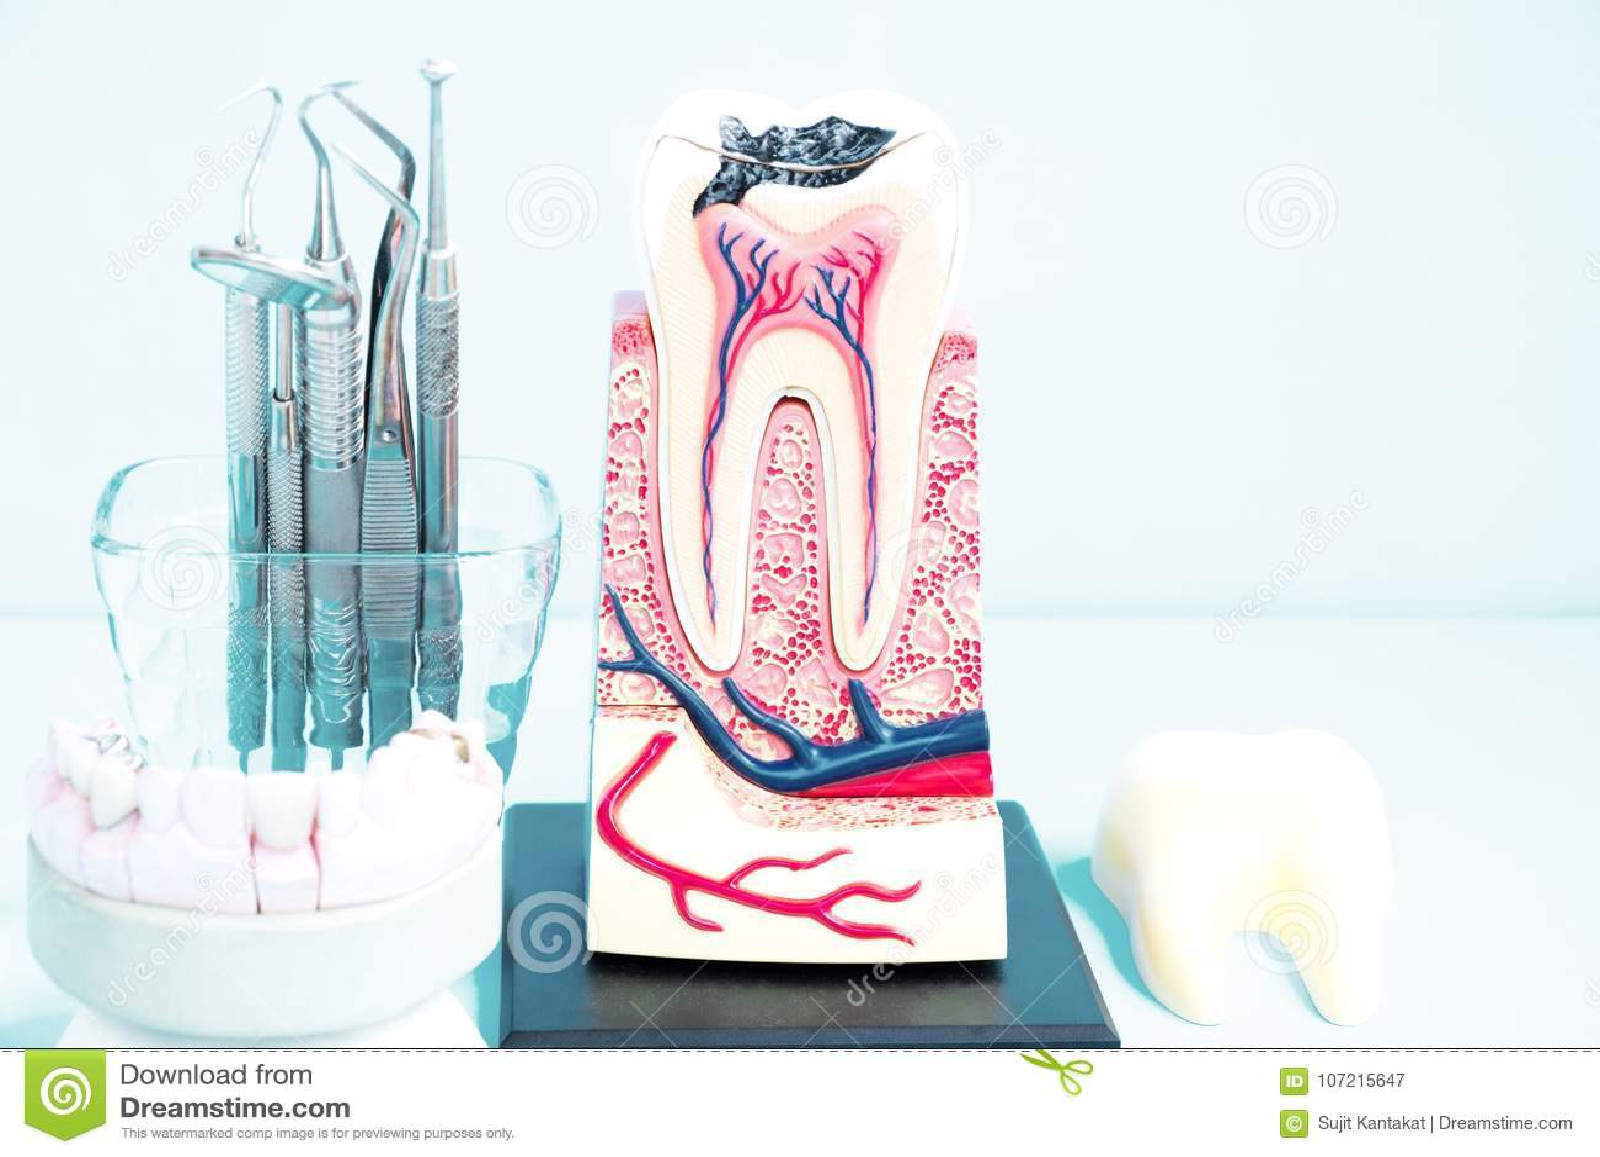 Dental Tools And Tooth Anatomy. Stock Image - Image of anatomy ...